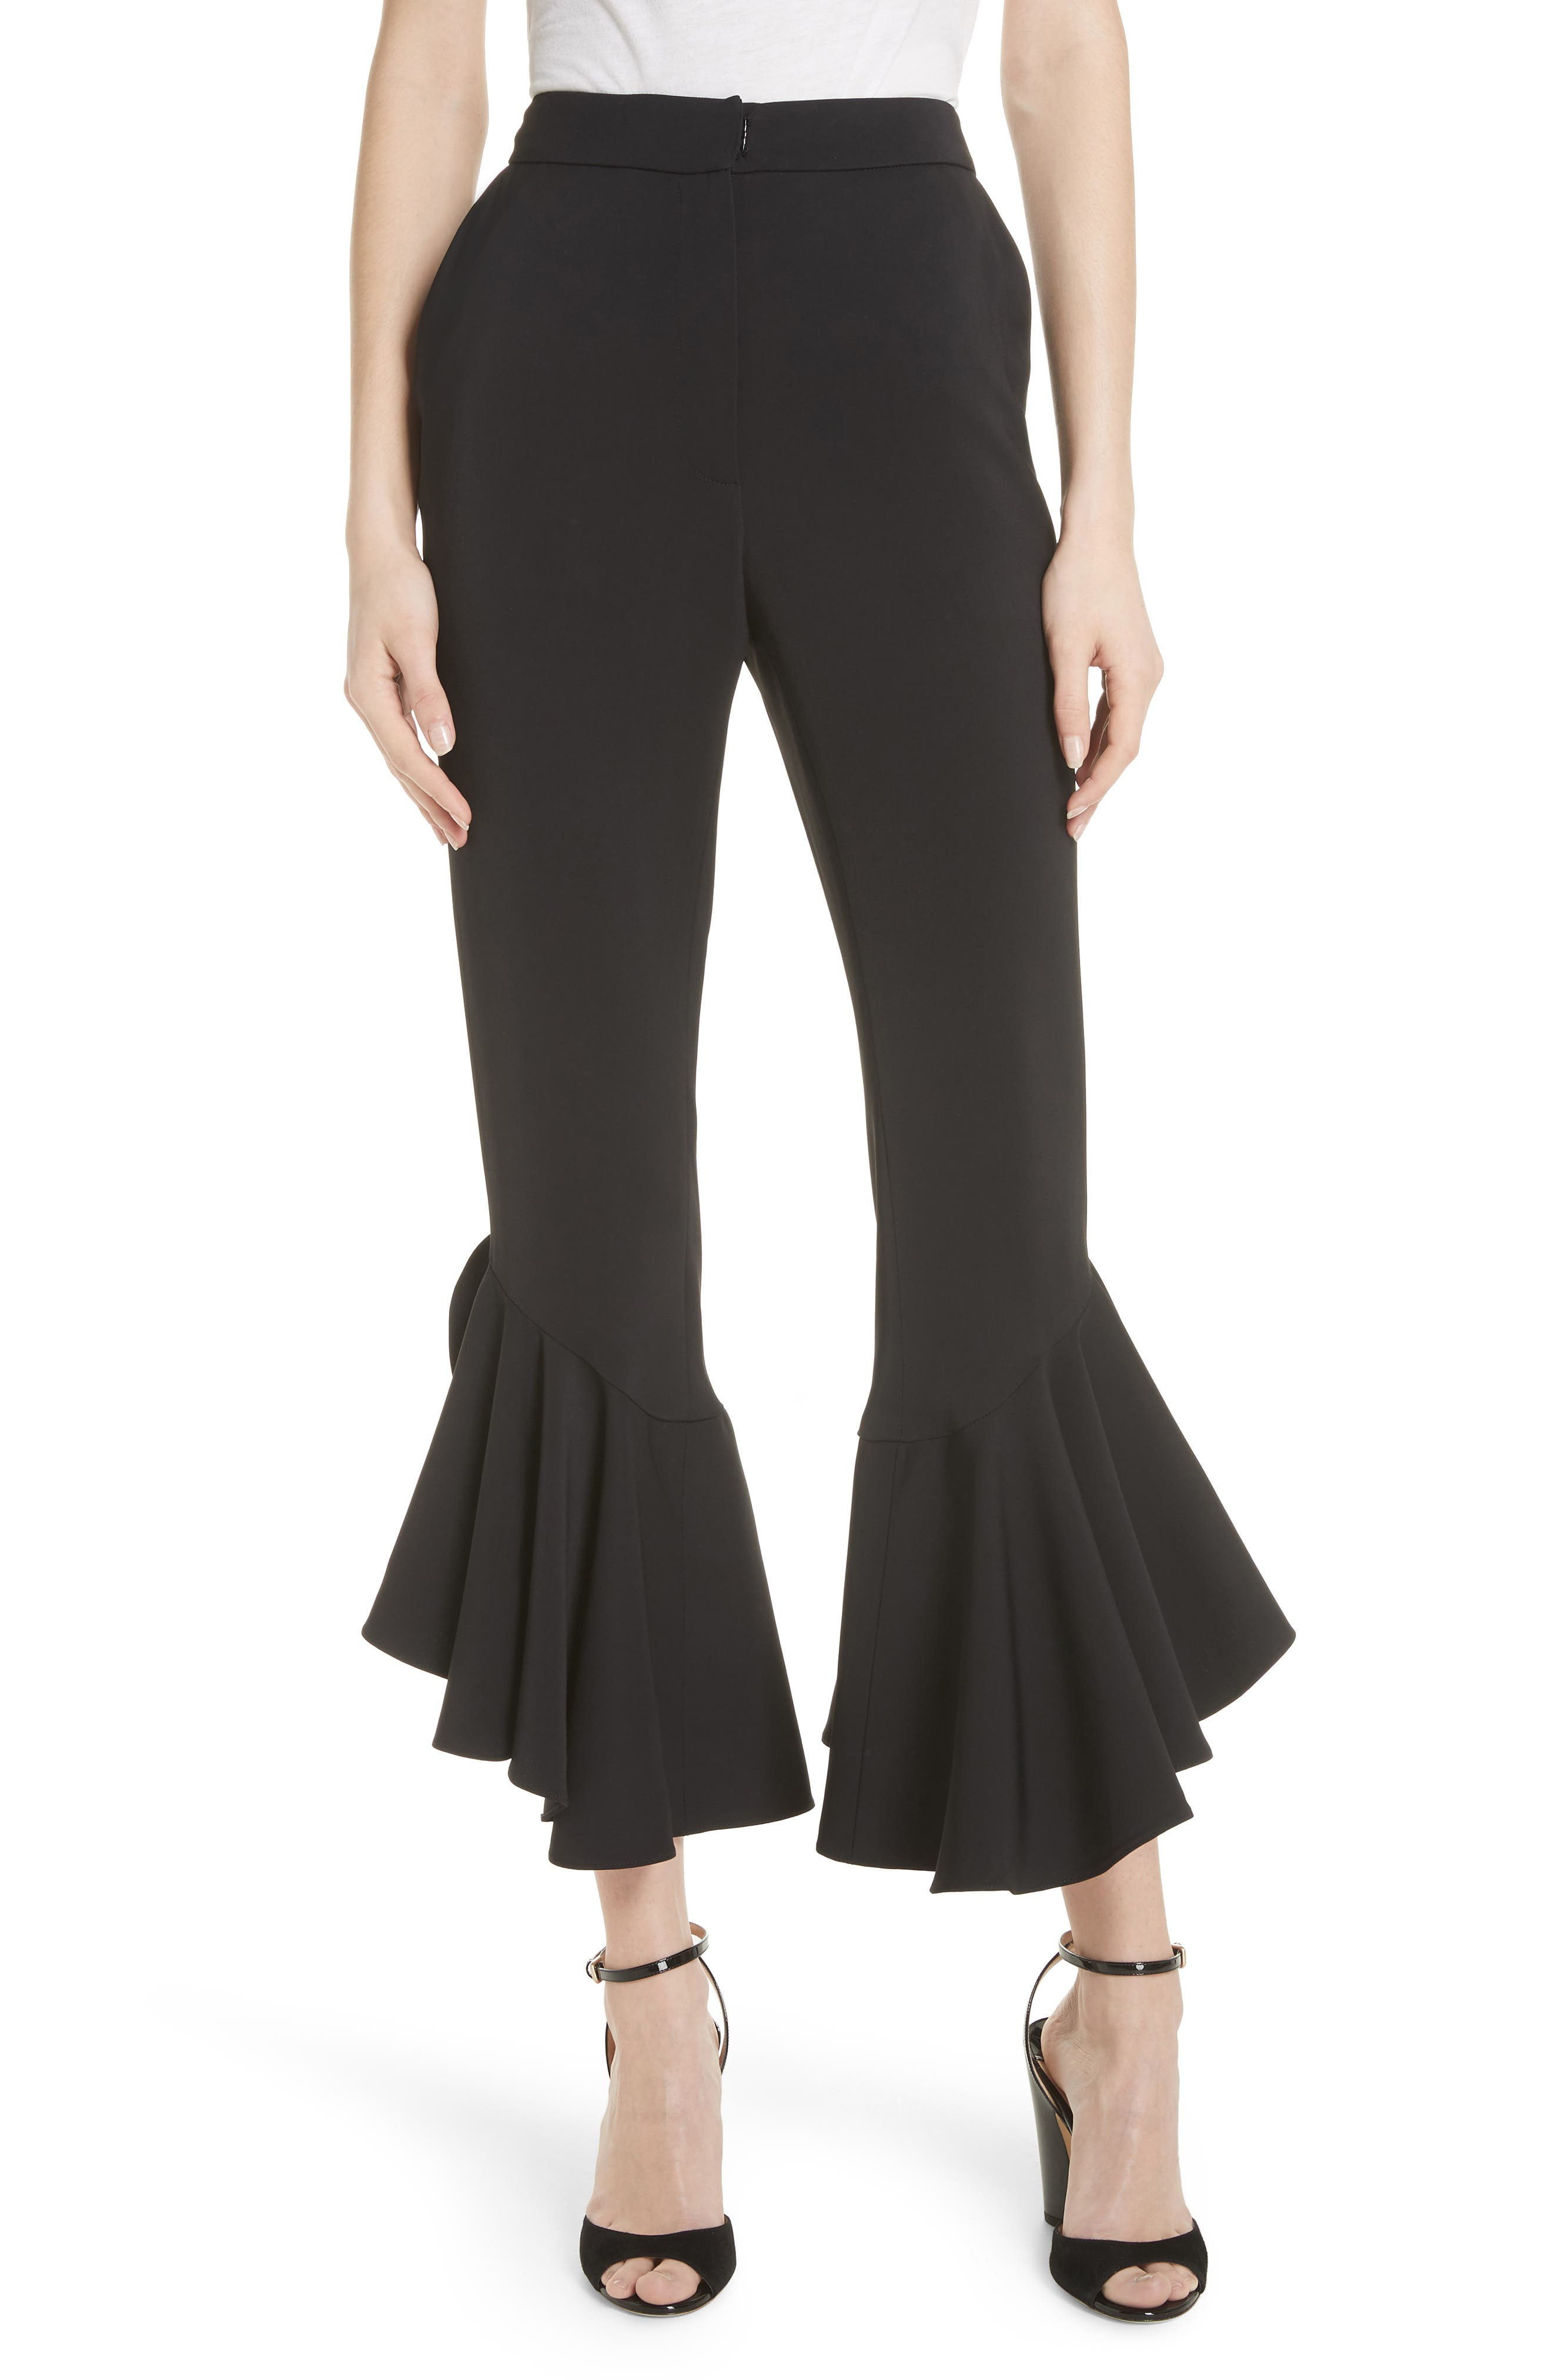 TRACY REESE Ruffle Pants, Main, color, 001